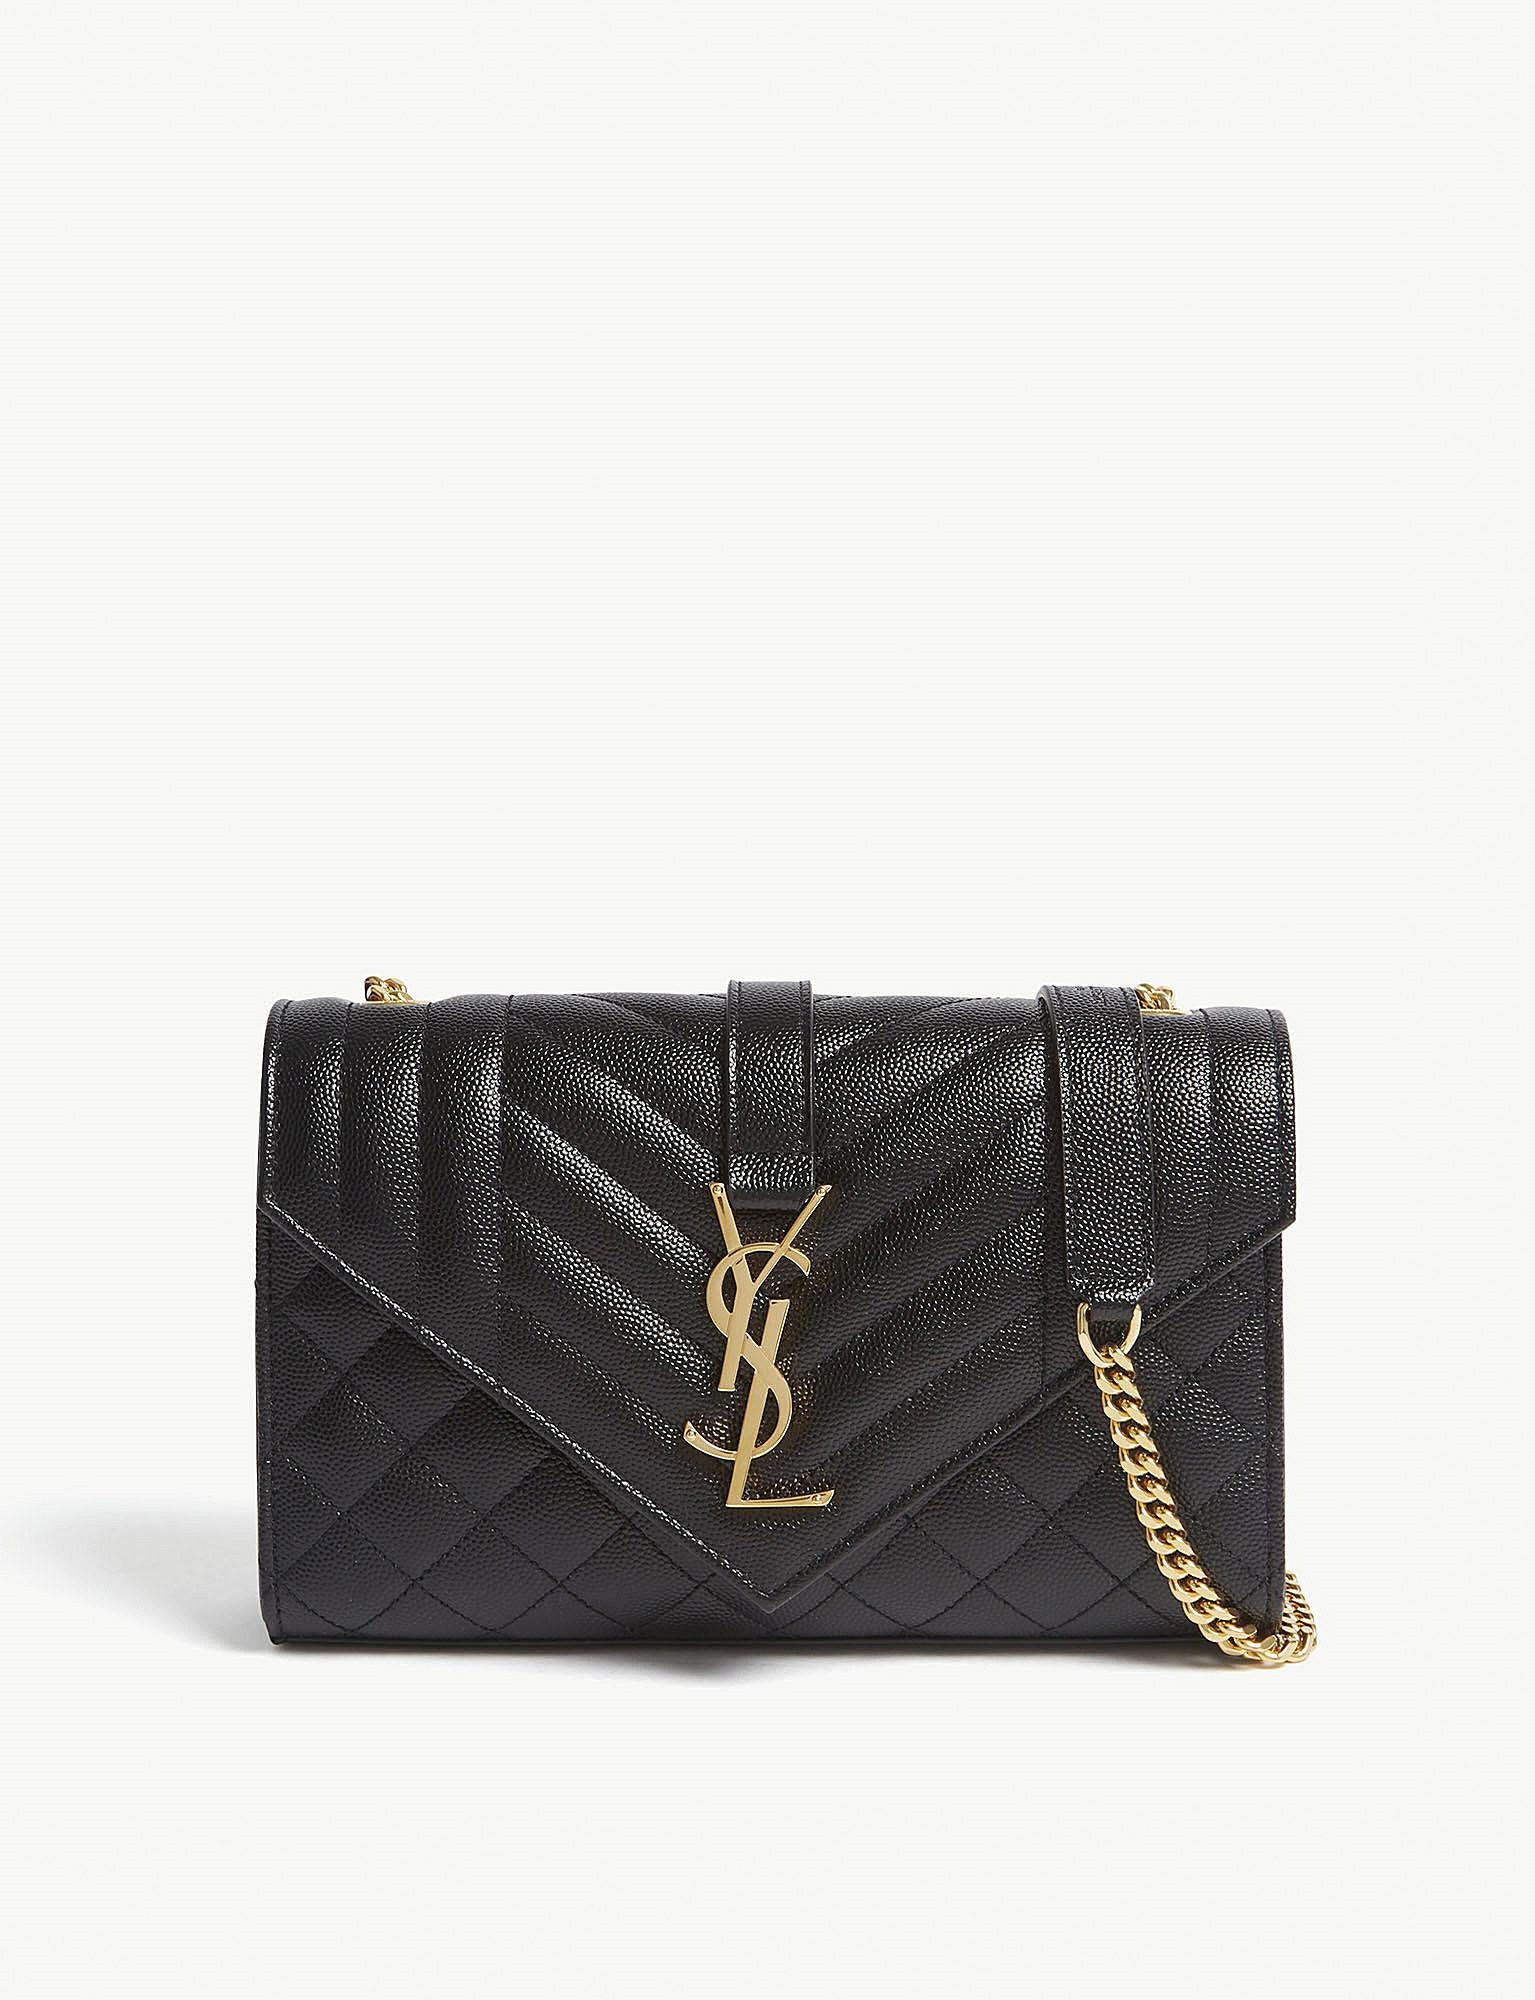 a0be832de855 Saint Laurent. Women s Black And Gold Monogram Quilted Pebbled Leather  Satchel